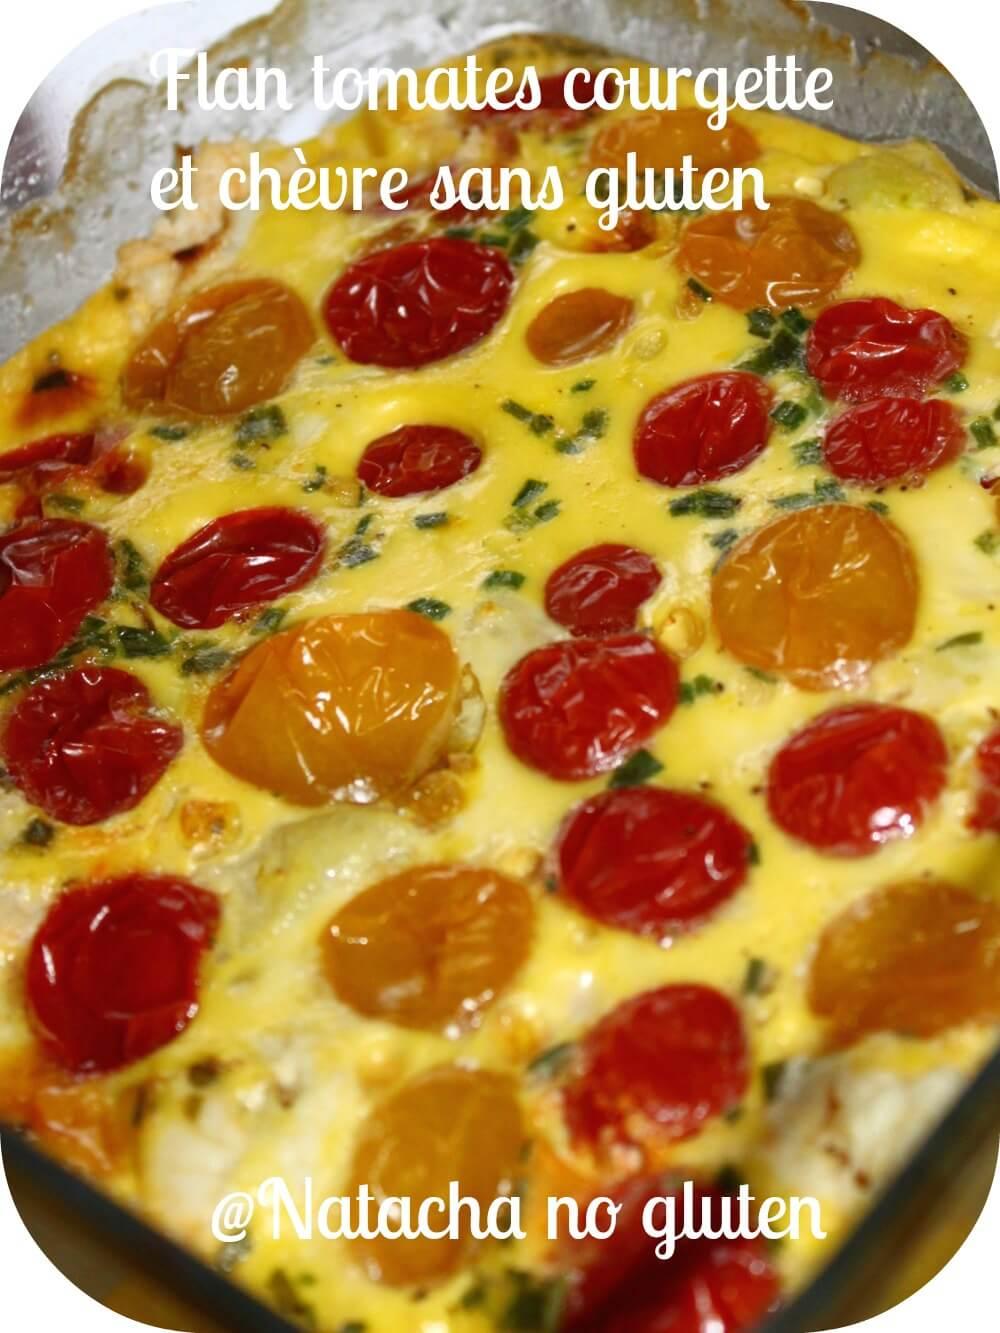 flan-tomate-courgette-chevre2